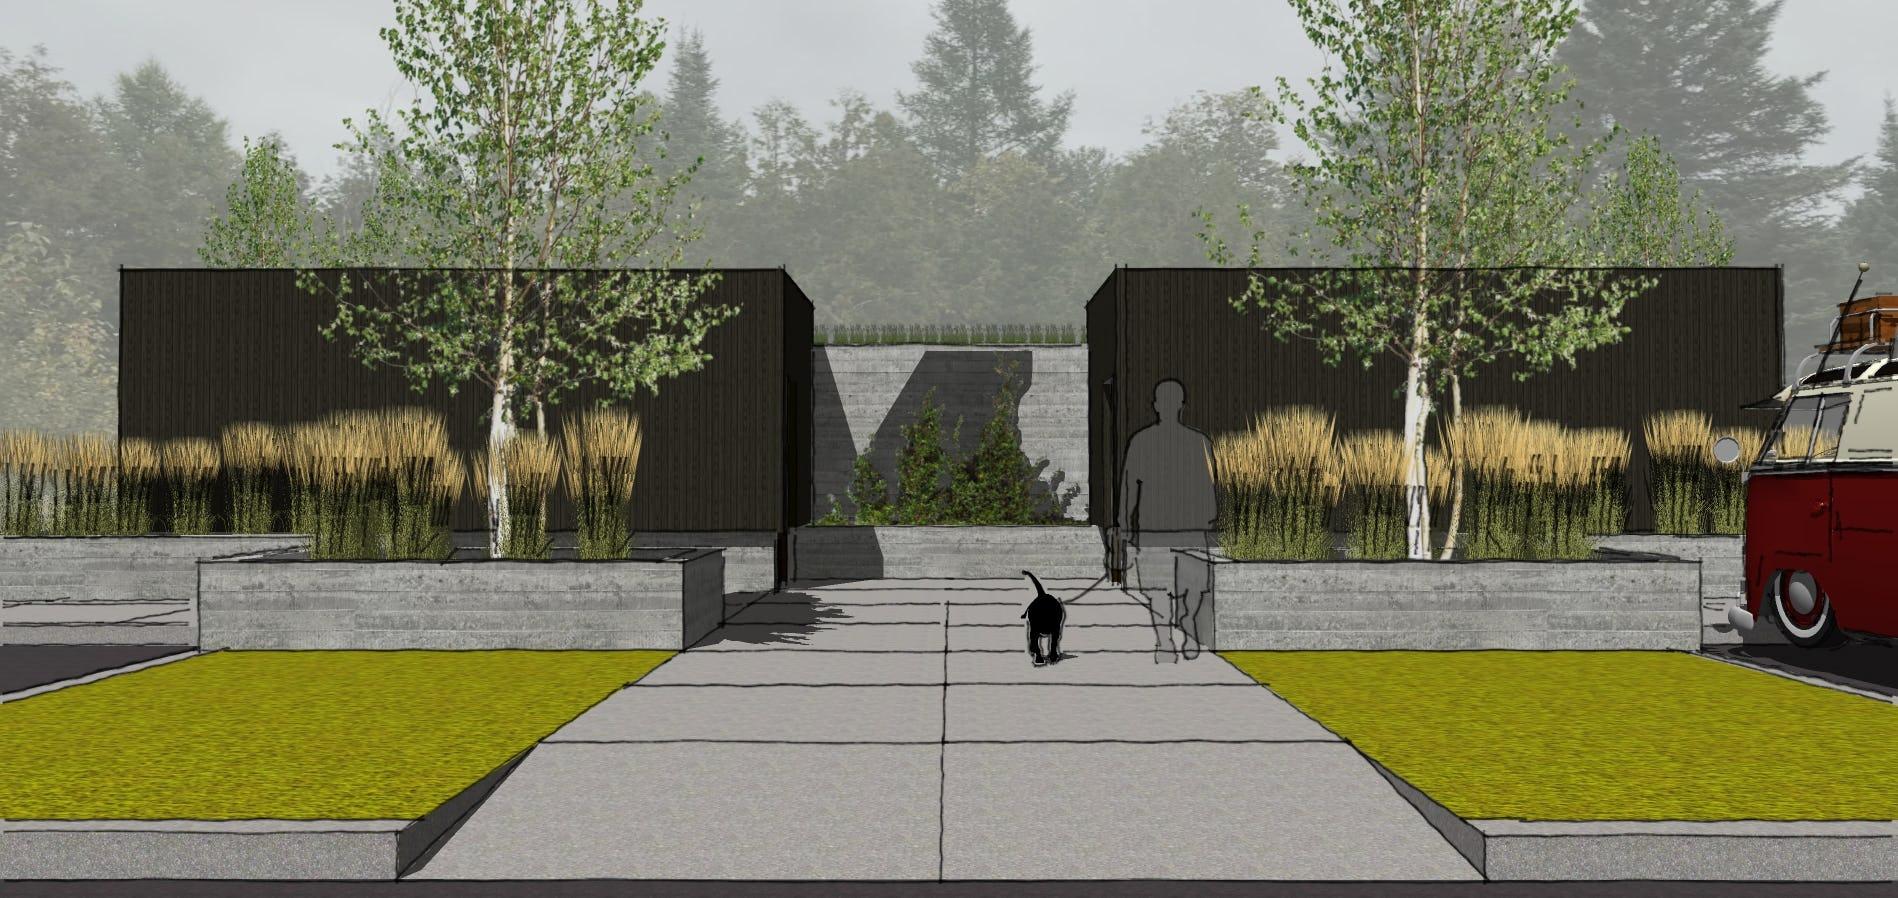 Northern michigan modern architecture campground emmet county architect